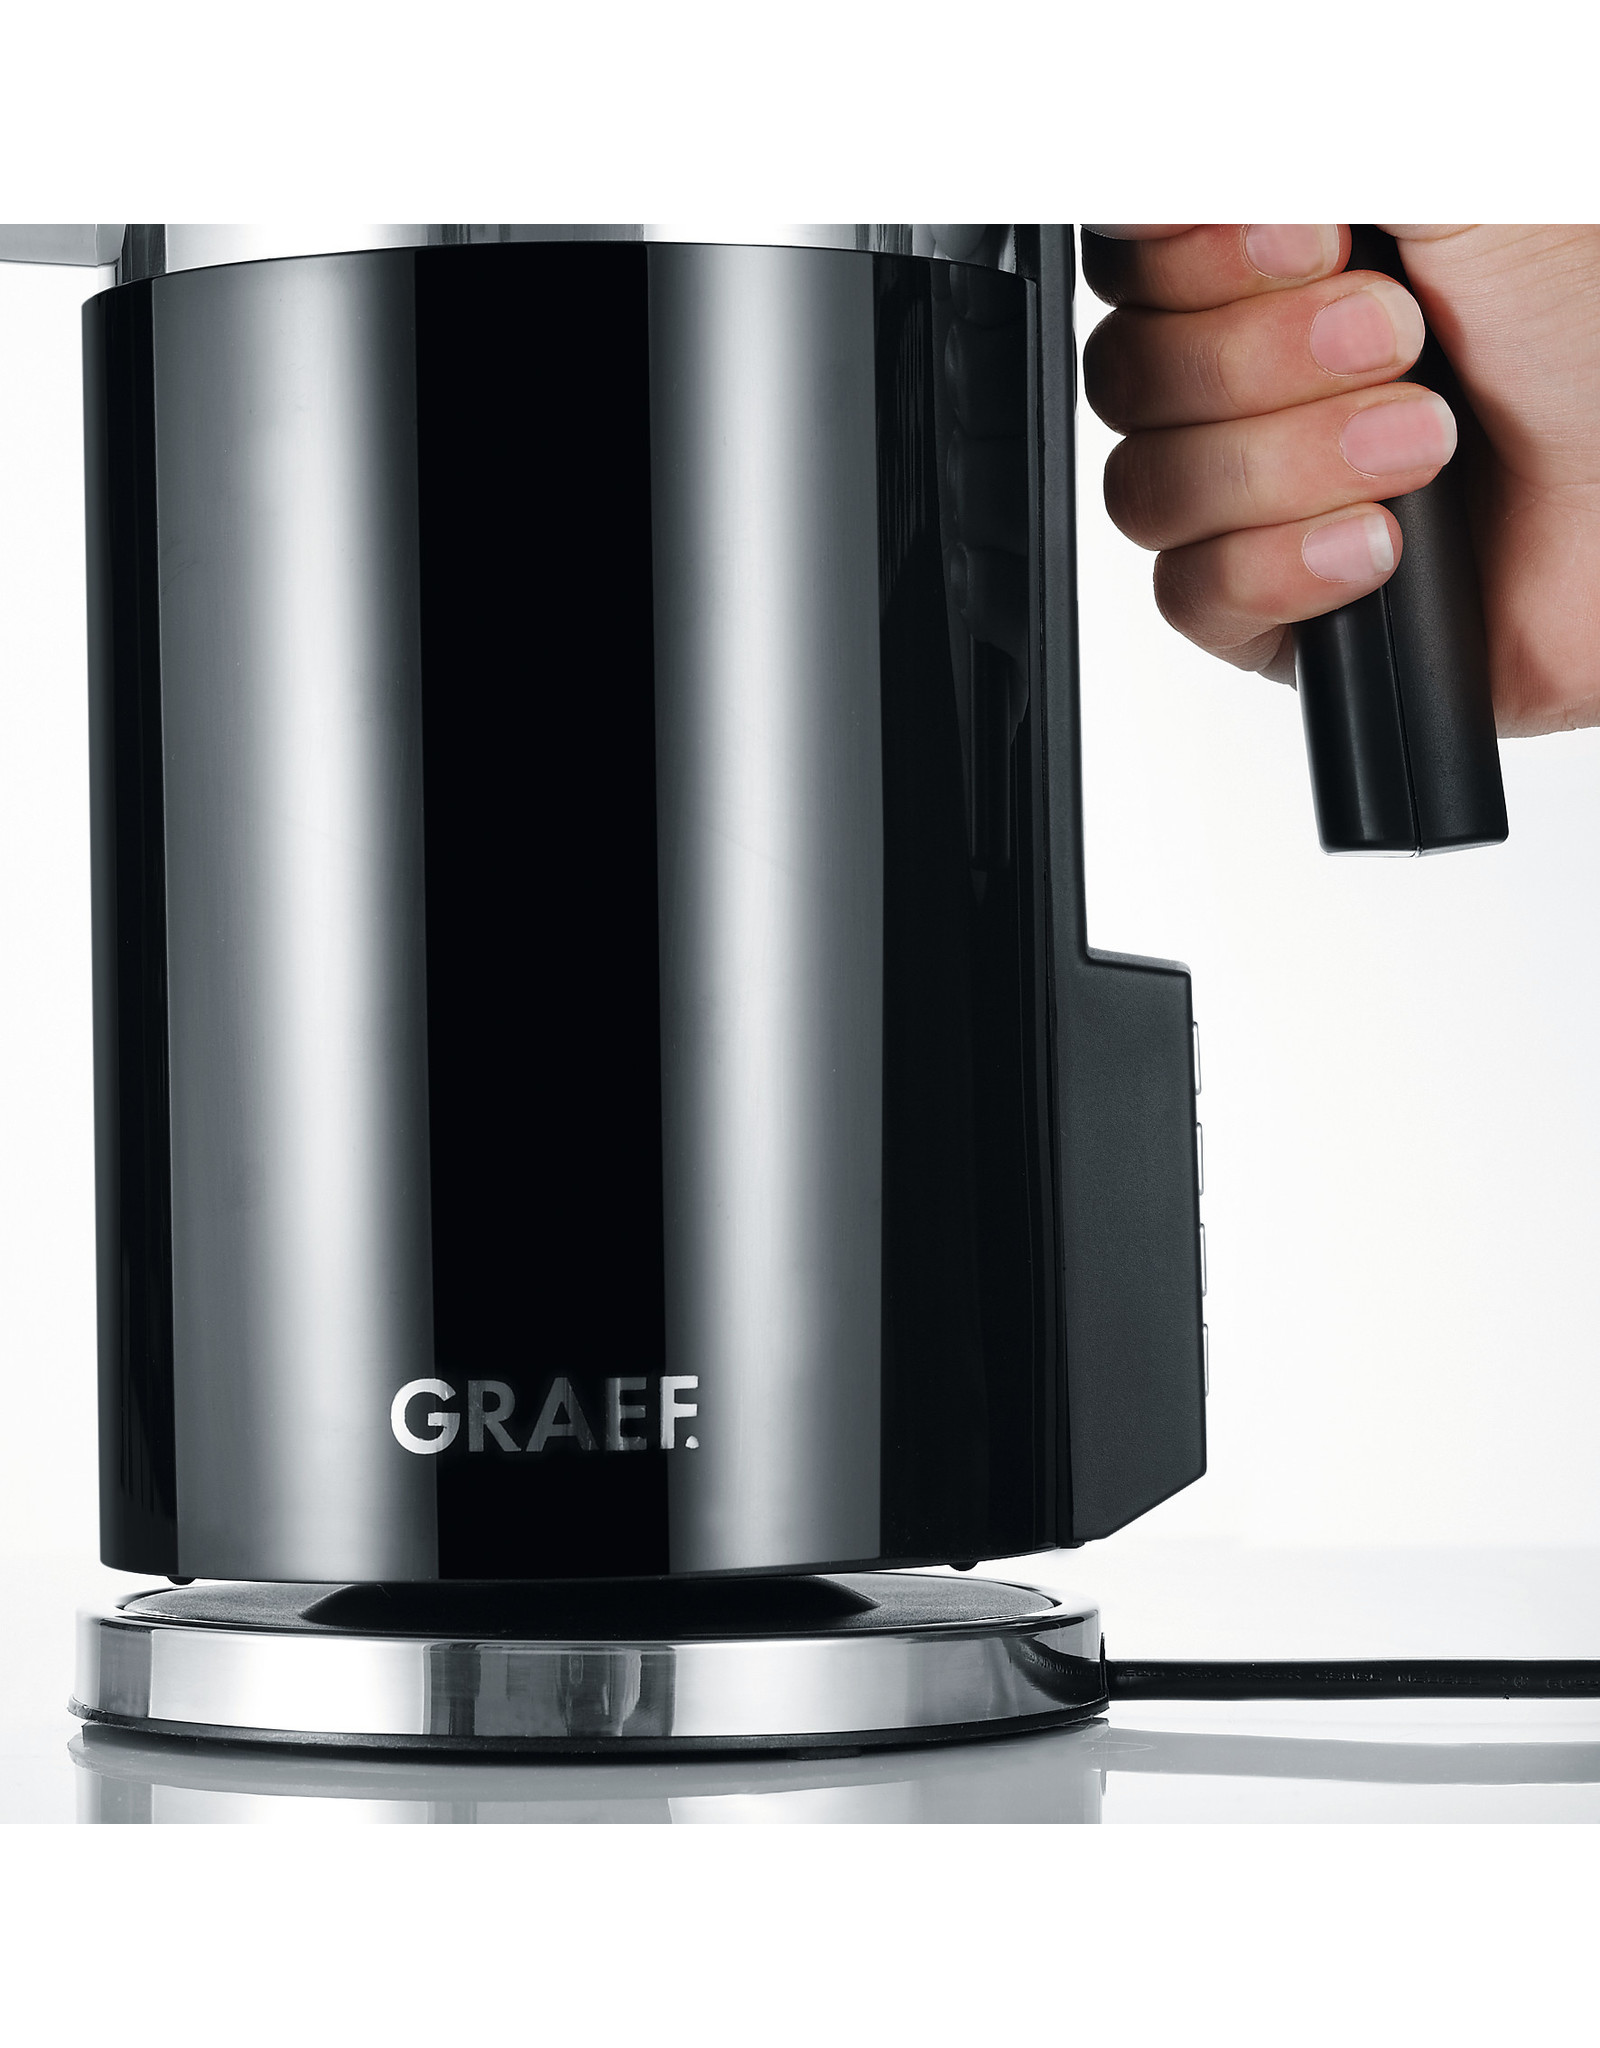 GRAEF GRAEF 45702 WATERKOKER 1,5 LTR. WK702 ZWART  VARIABEL